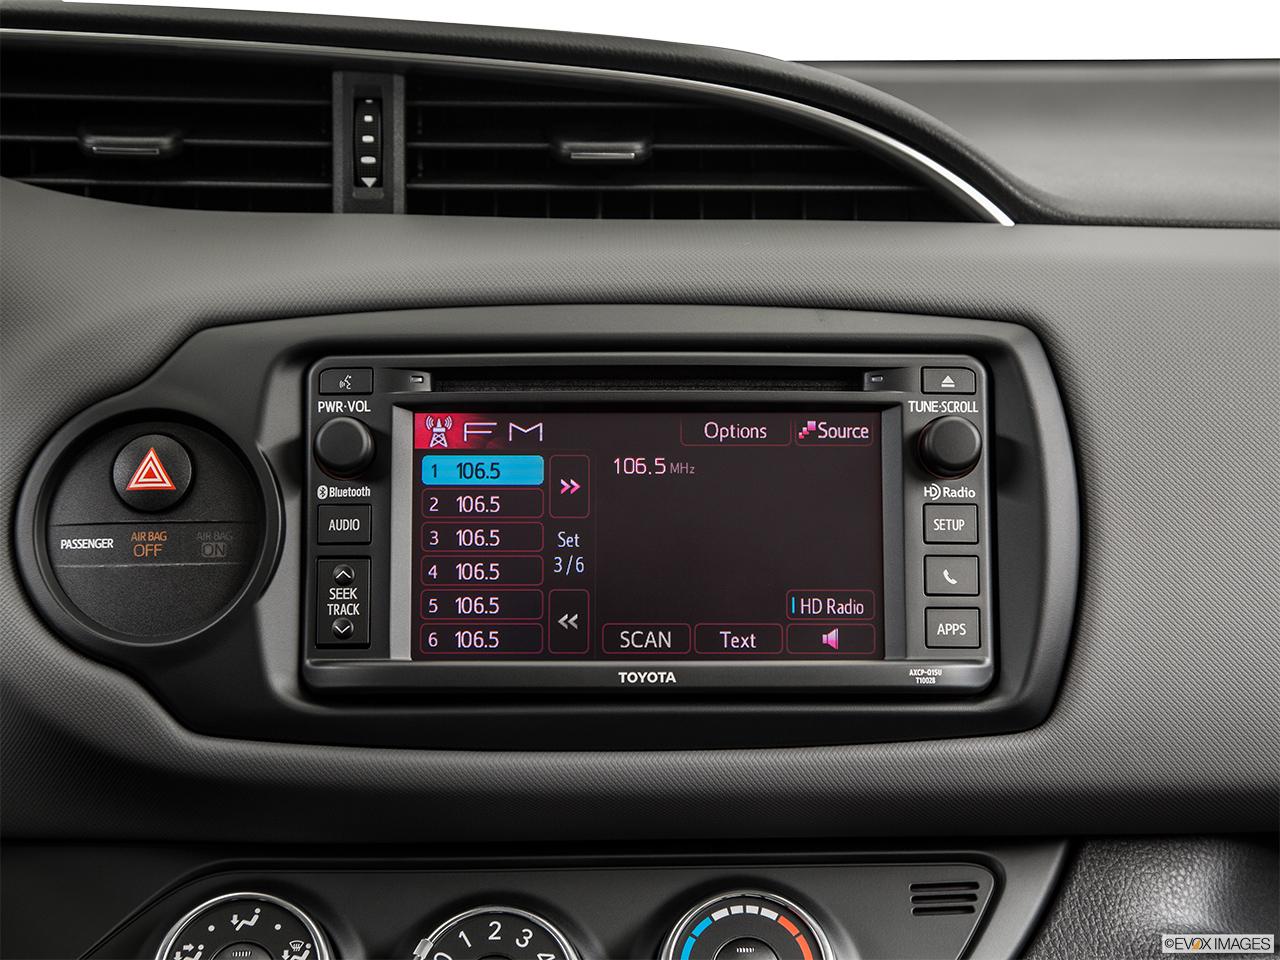 Toyta Yaris 2015 Manual Need Wiring Diagram From Radio Harness2002ls430radio3jpg Array Toyota 5dr Liftback Se Front Angle View Rh Carnow Com